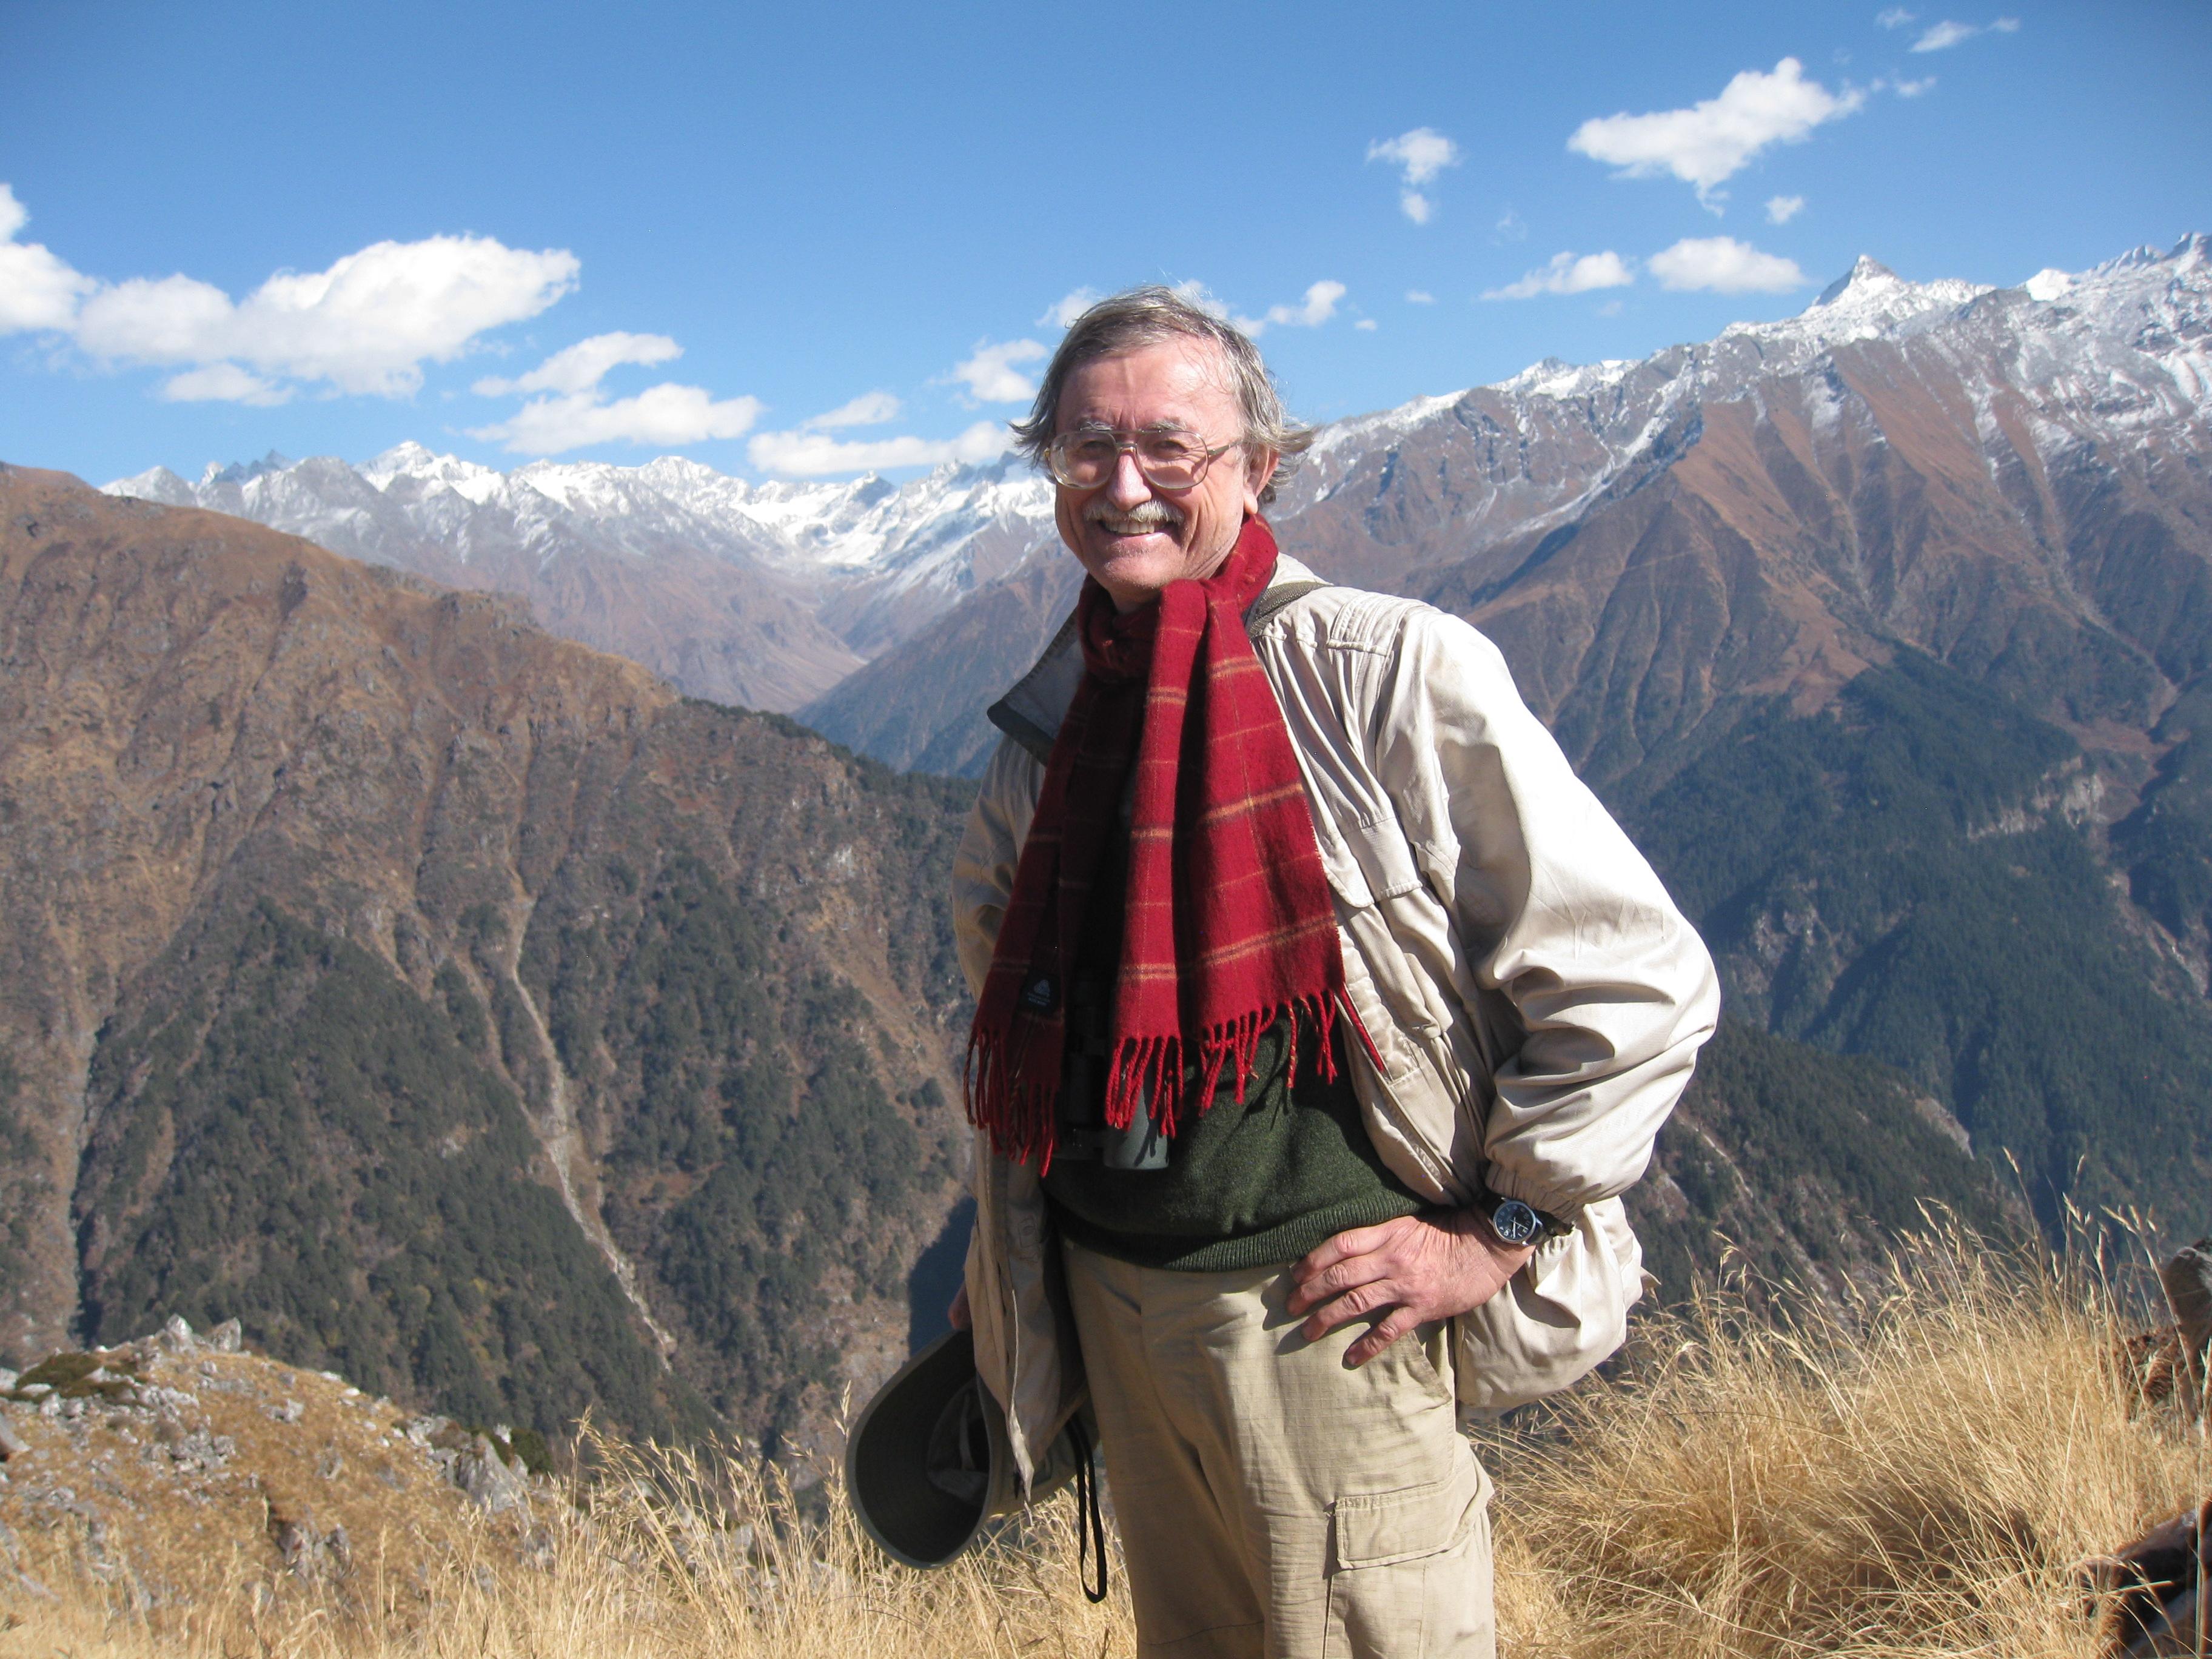 Bob-in-the-Himalayas